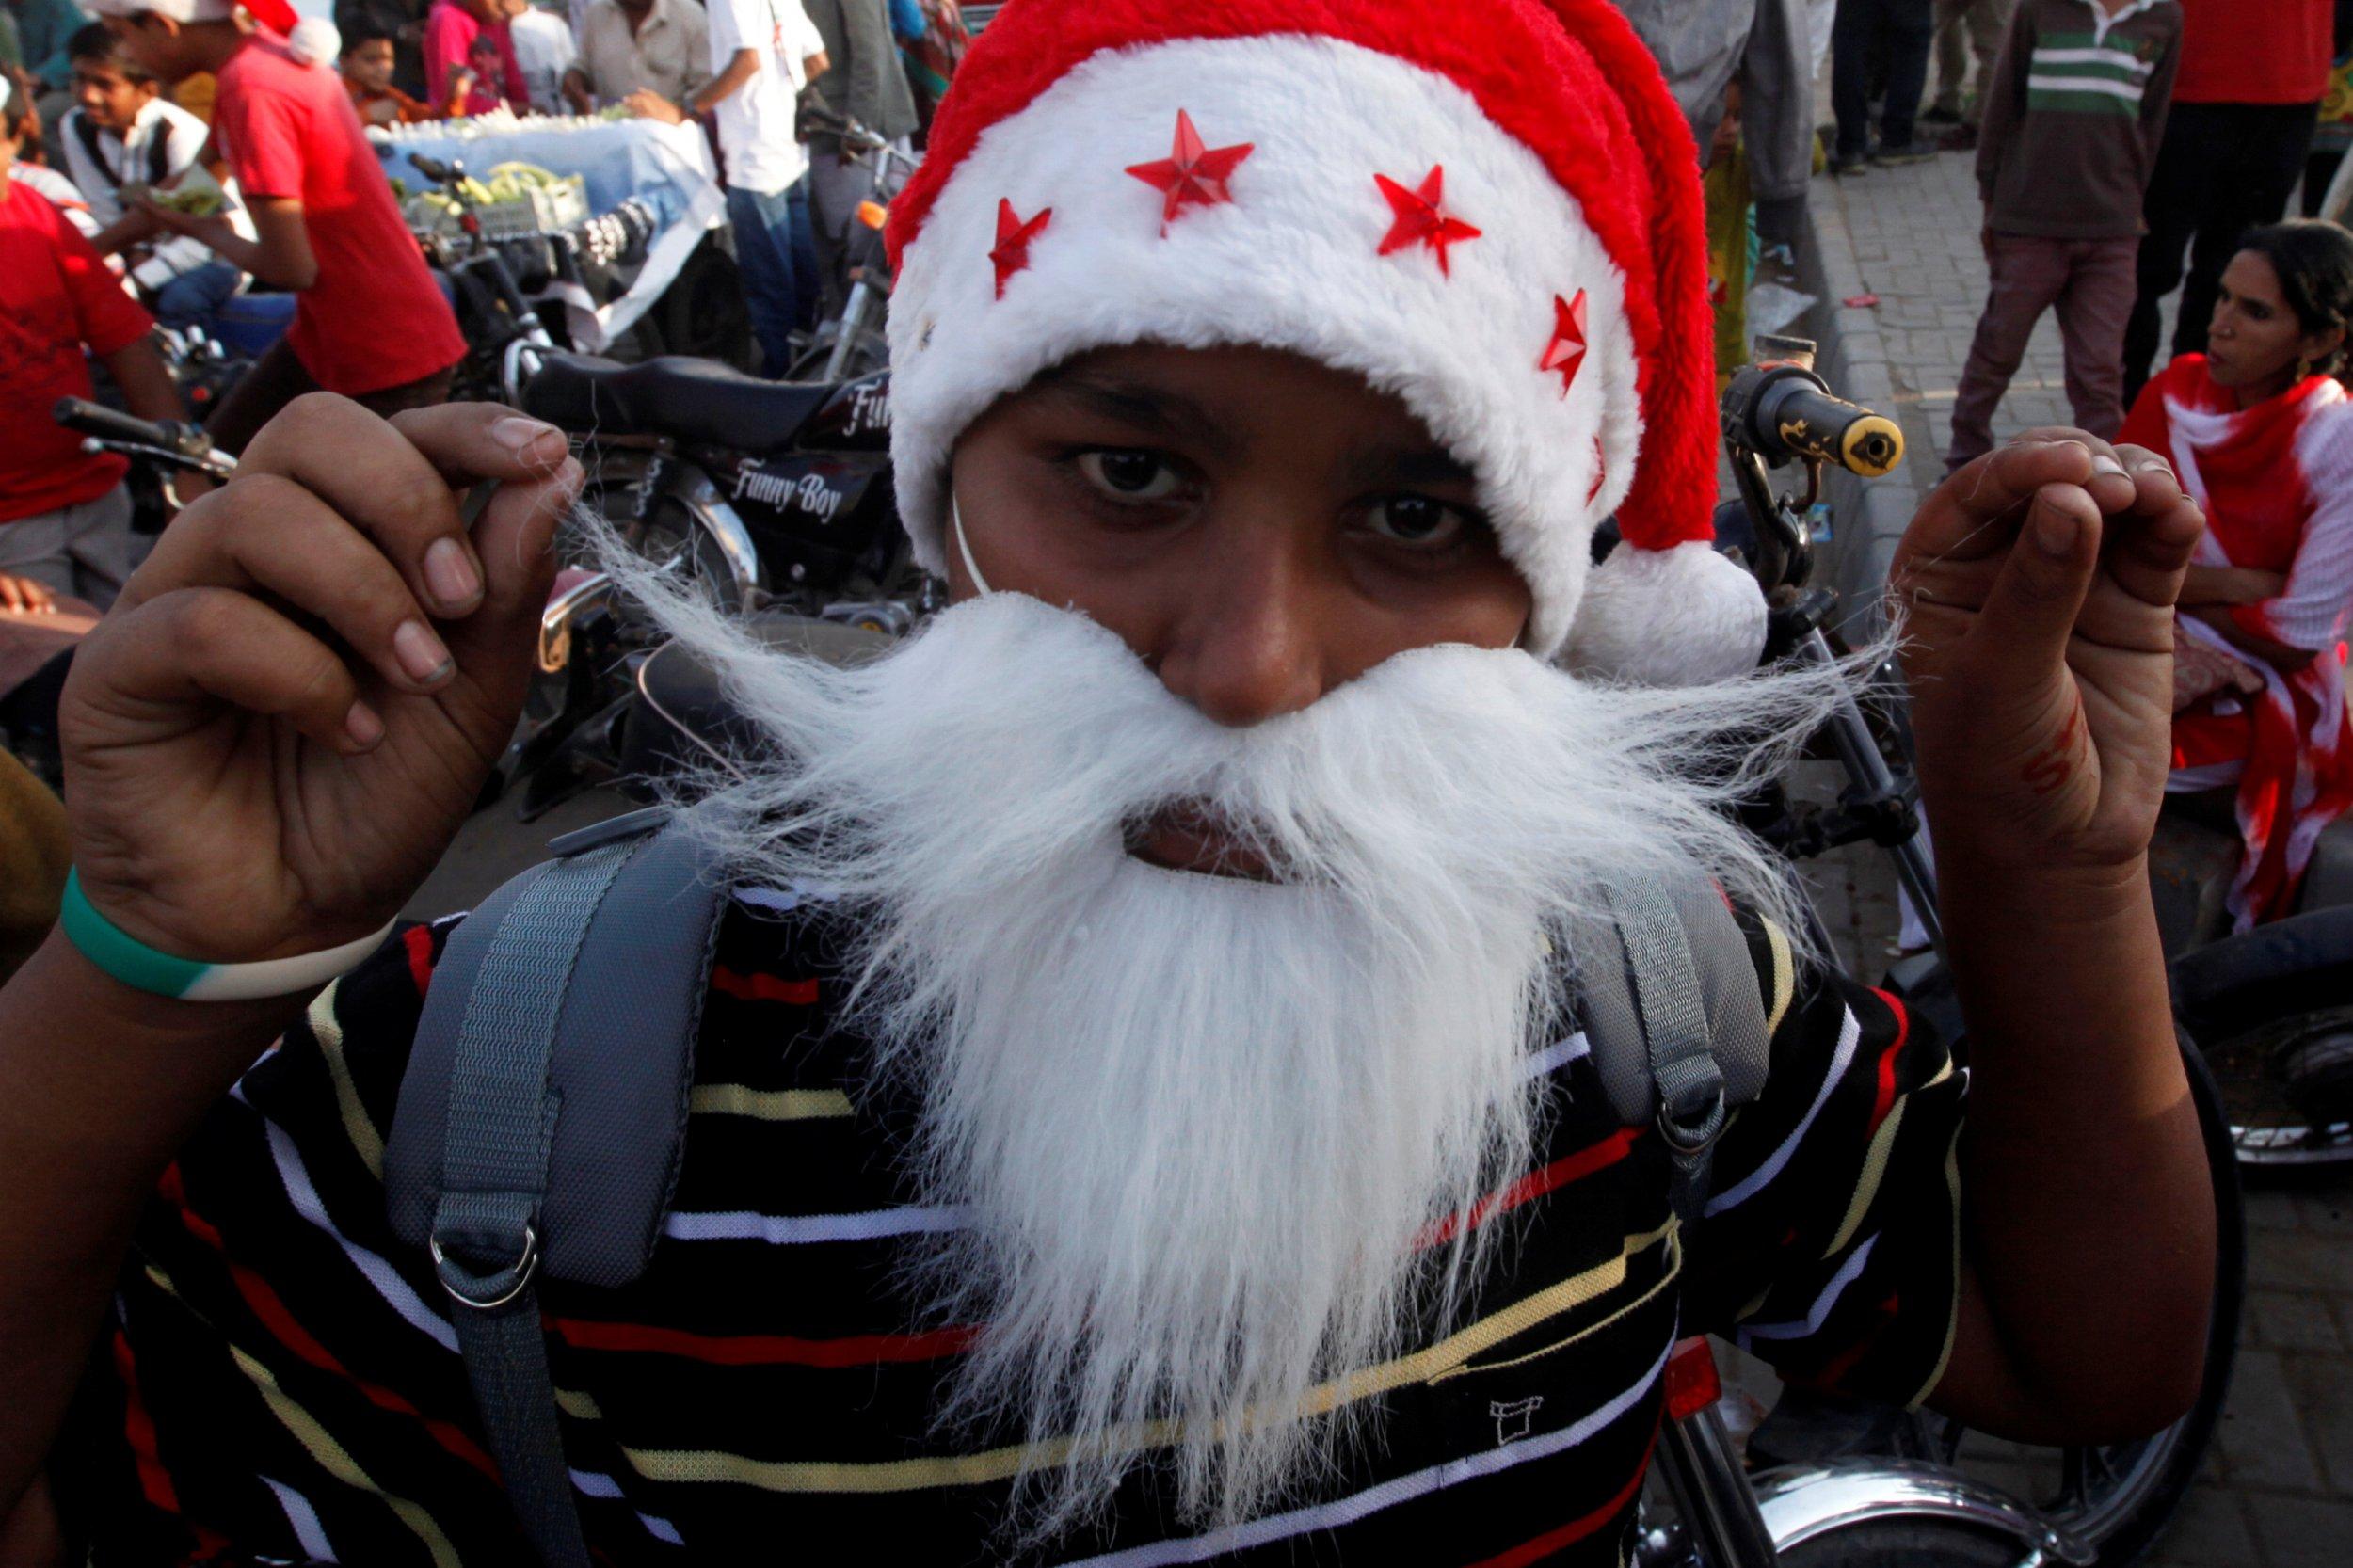 A boy wears Santa Claus' hat and beard